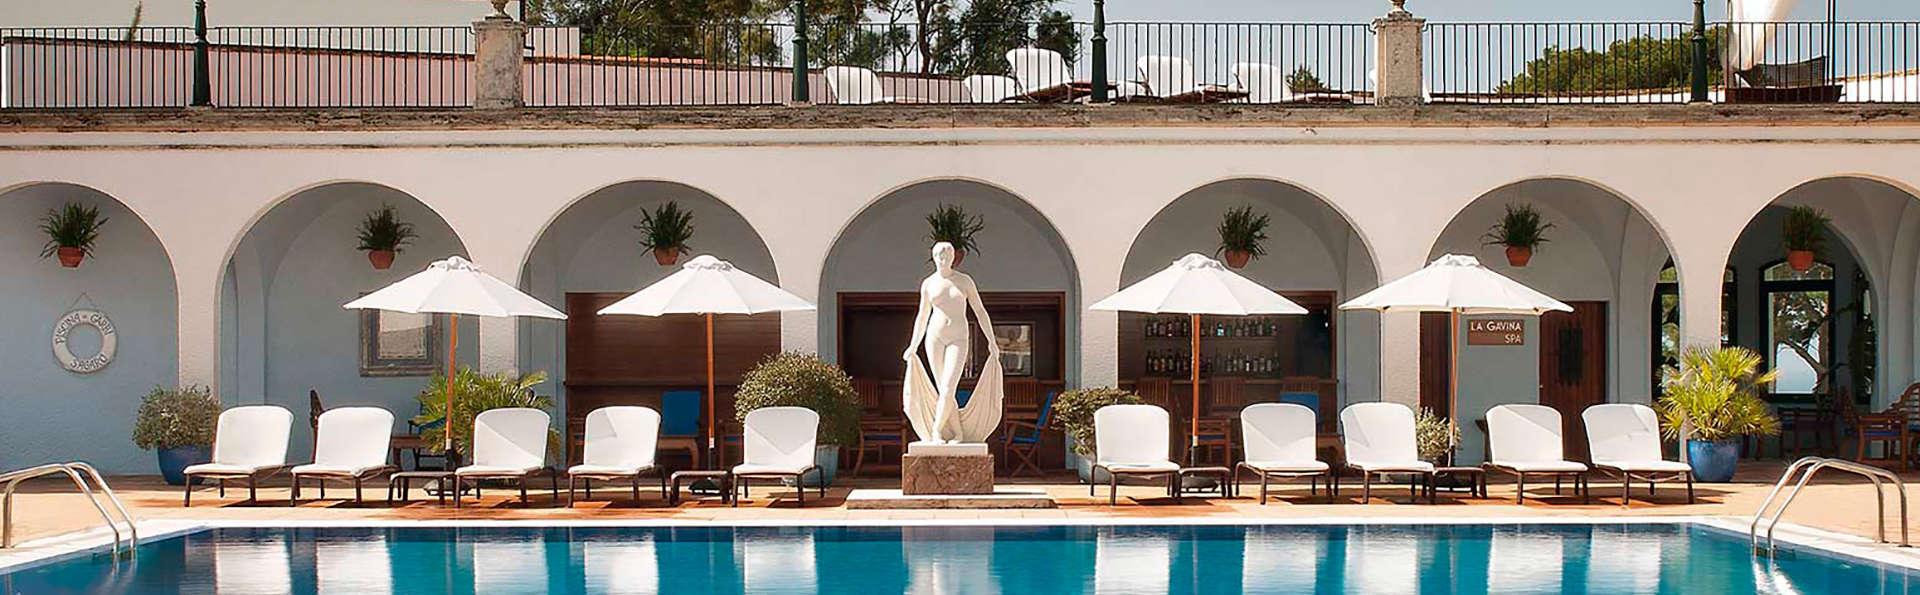 H tel hostal de la gavina h tel de charme s 39 agaro for Hotel la gavina